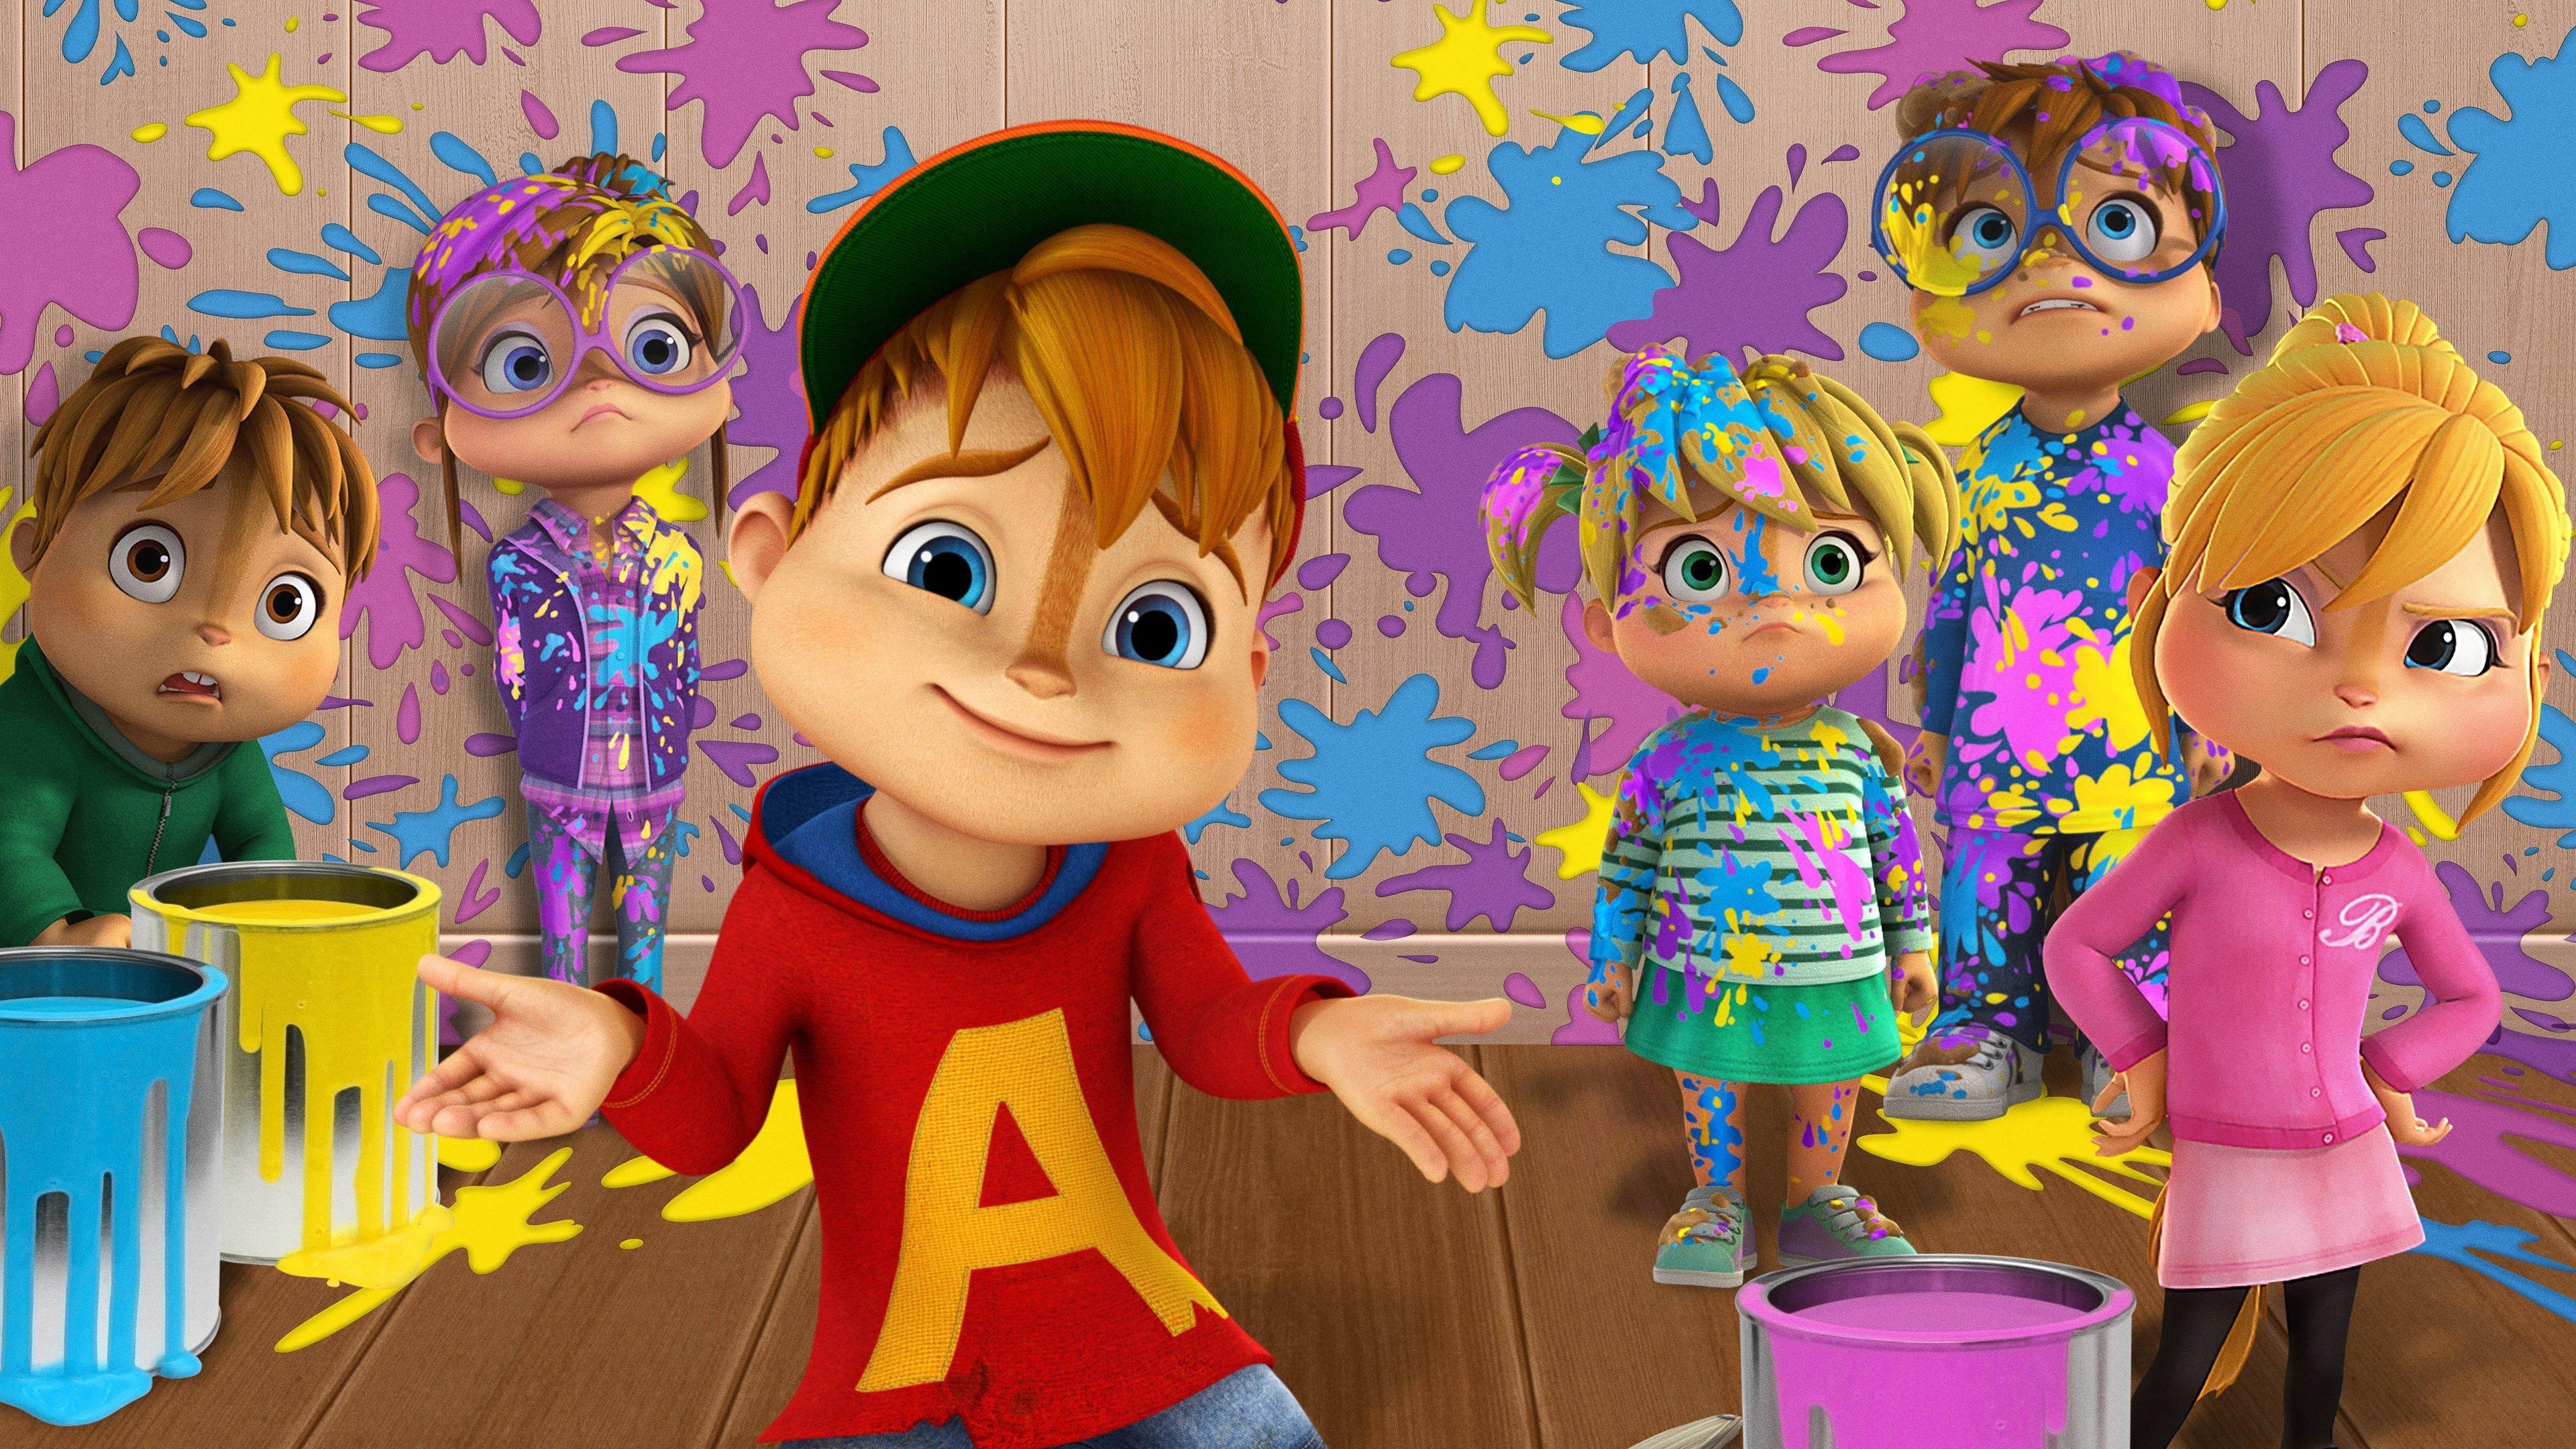 Alvinnn Si Veveritele Episodul 15 Alvinnn Si Veveritele Episodul 15 De A Clovnii Online Du Alvin And Chipmunks Movie Alvin And The Chipmunks Chipmunks